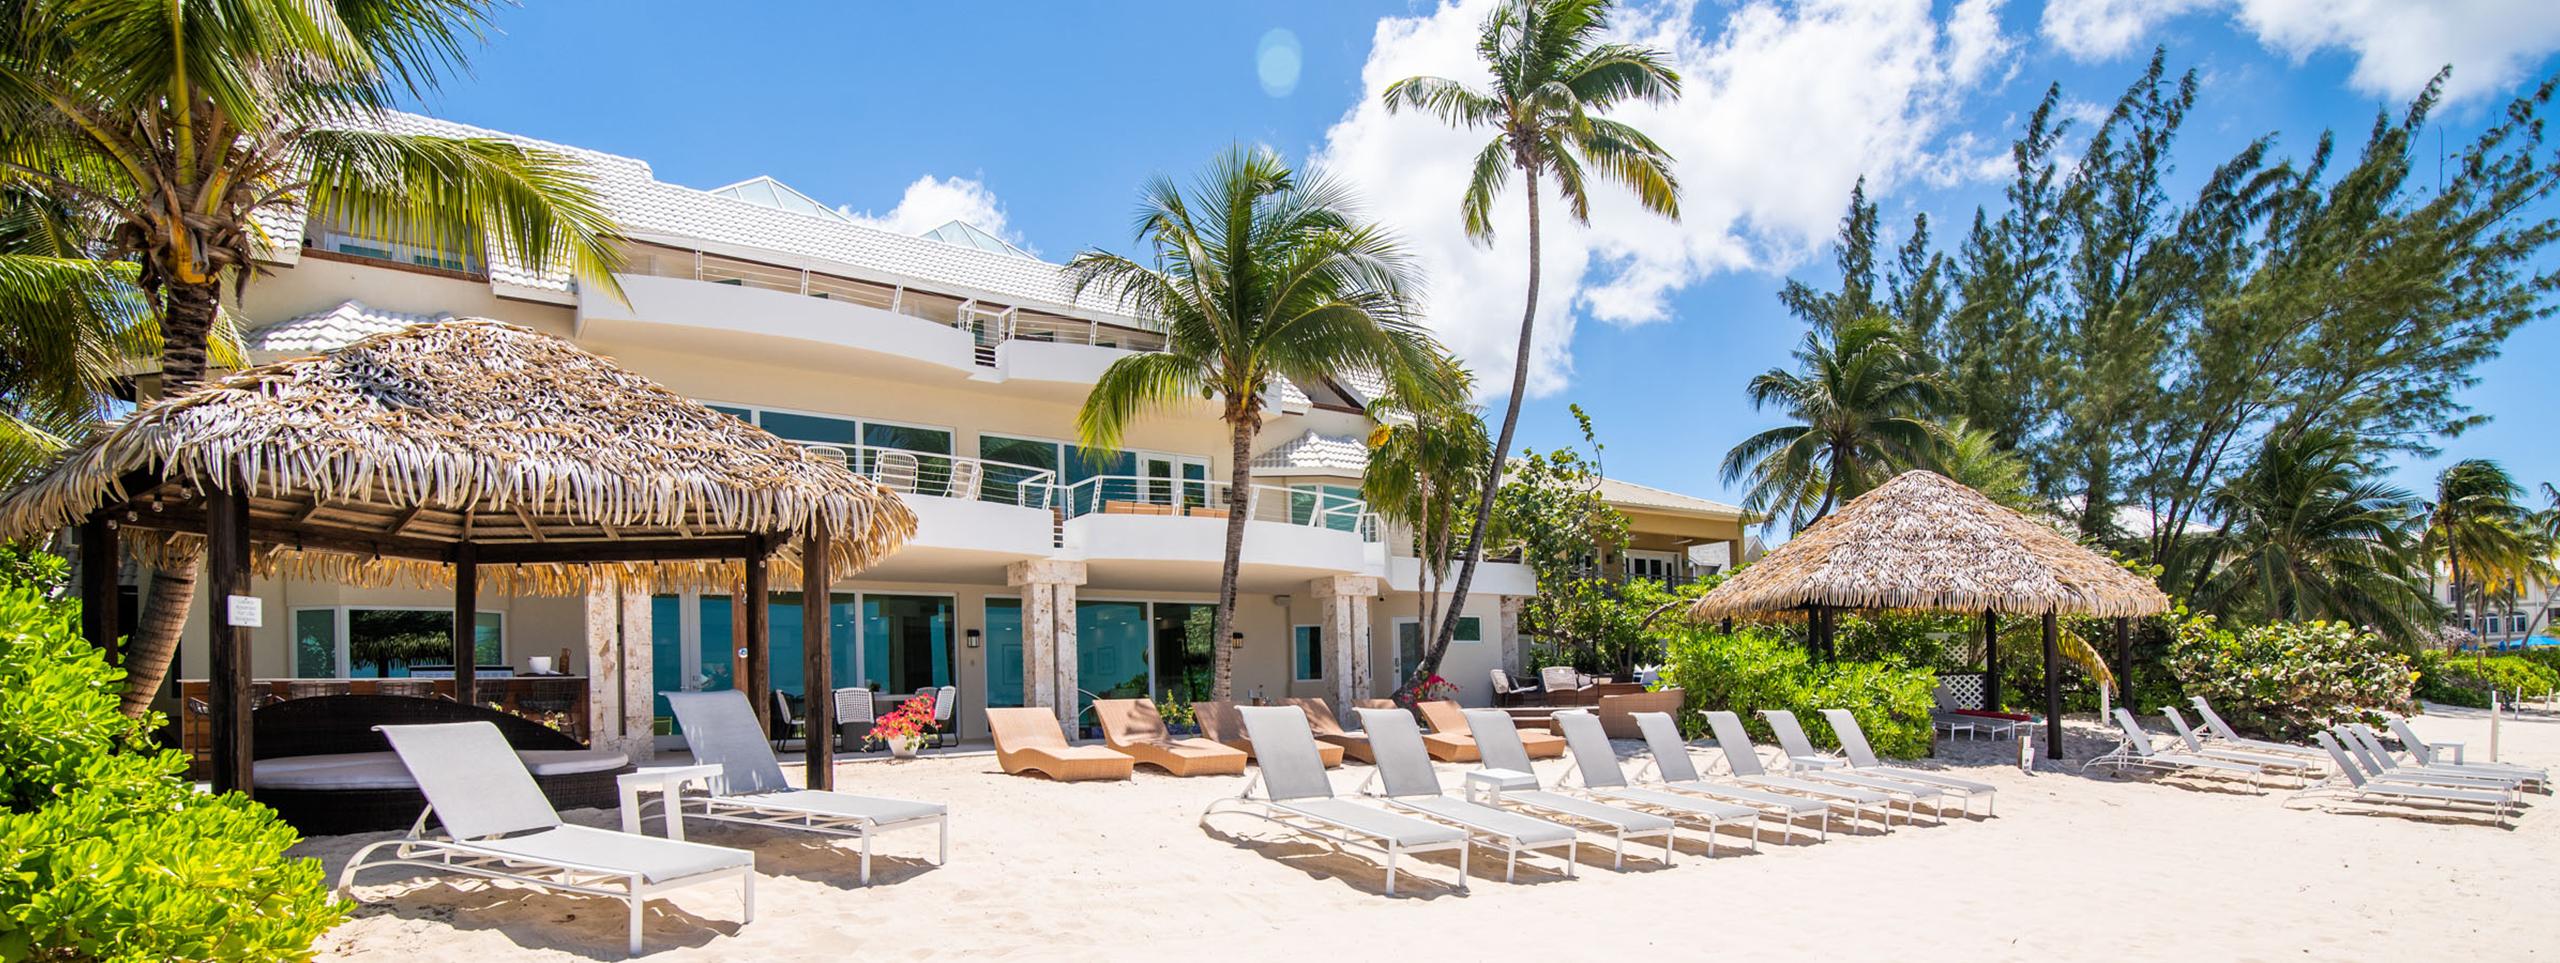 Seascape Villa Cayman Islands Book Now